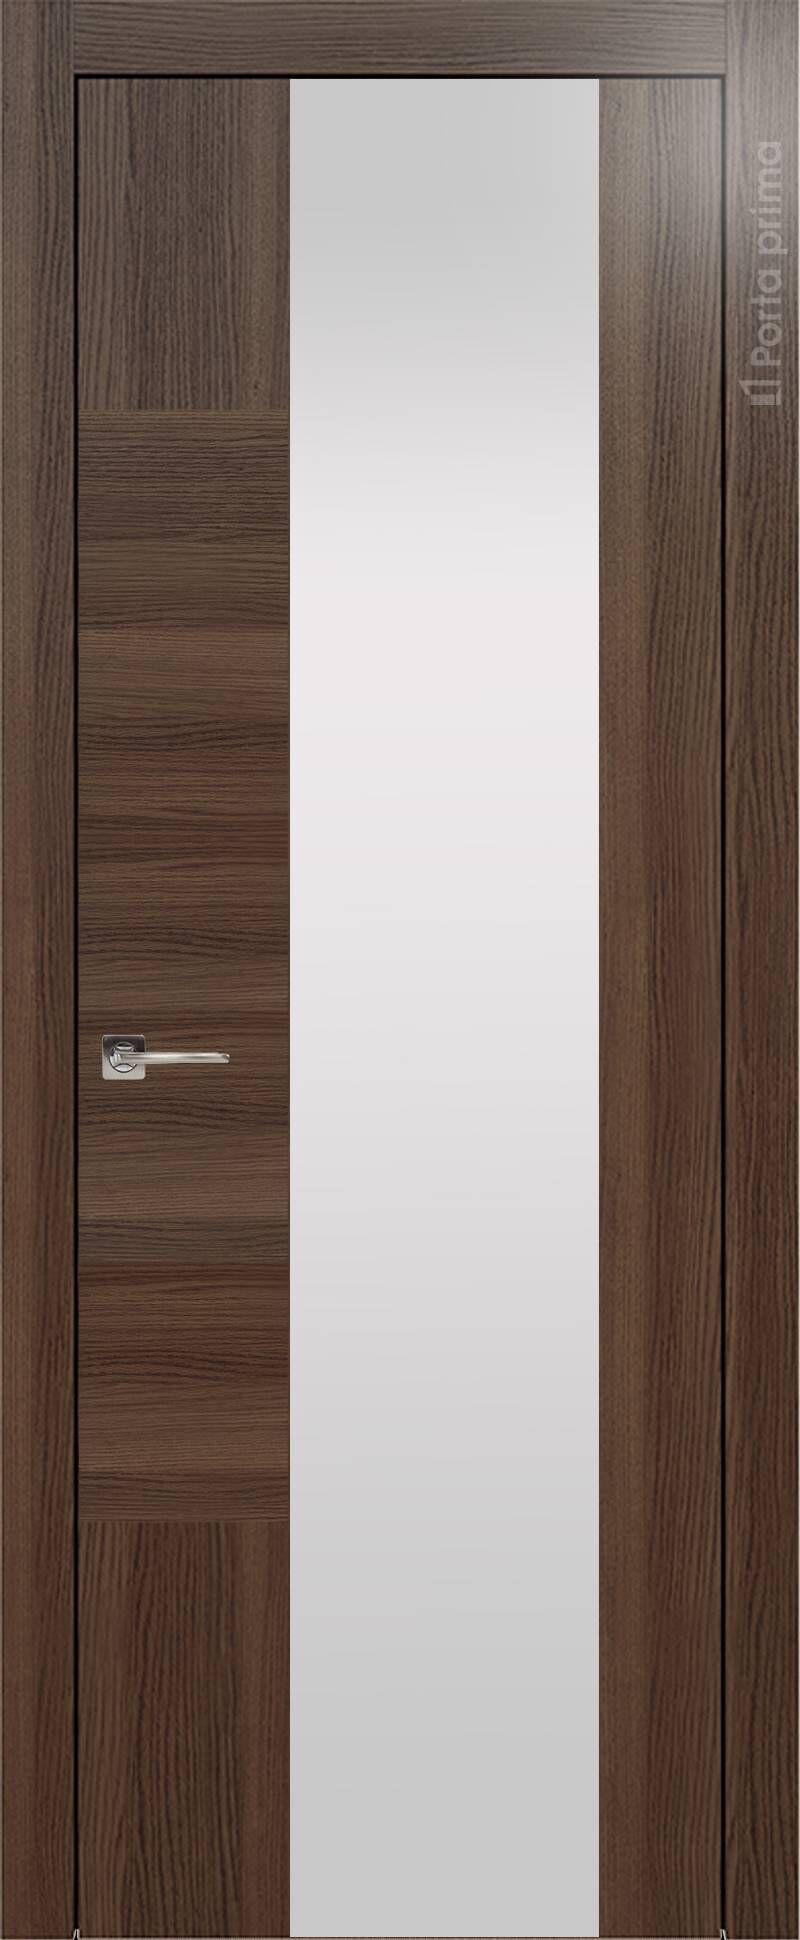 Tivoli Е-1 цвет - Дуб торонто Со стеклом (ДО)